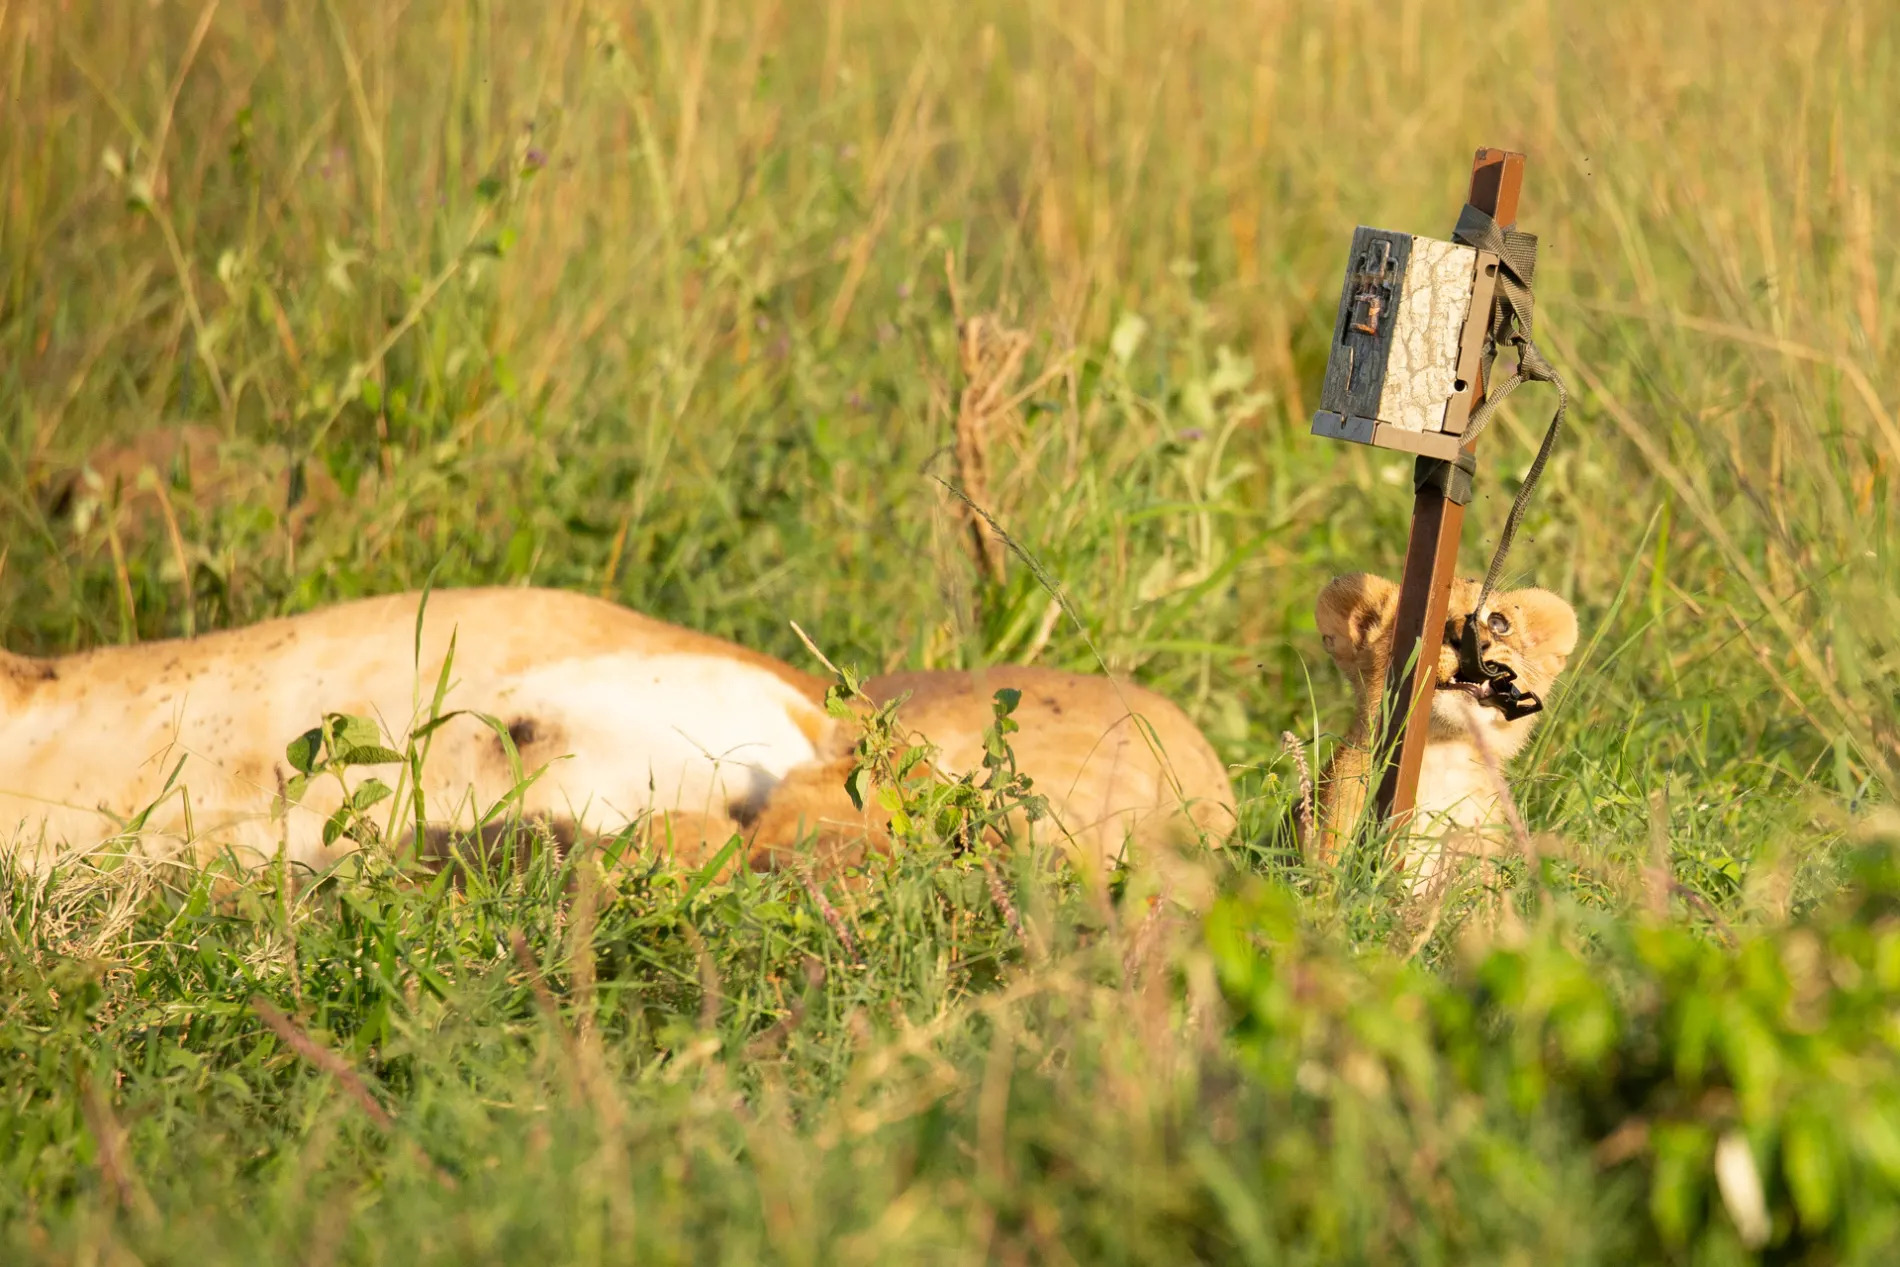 Lion cub and camera